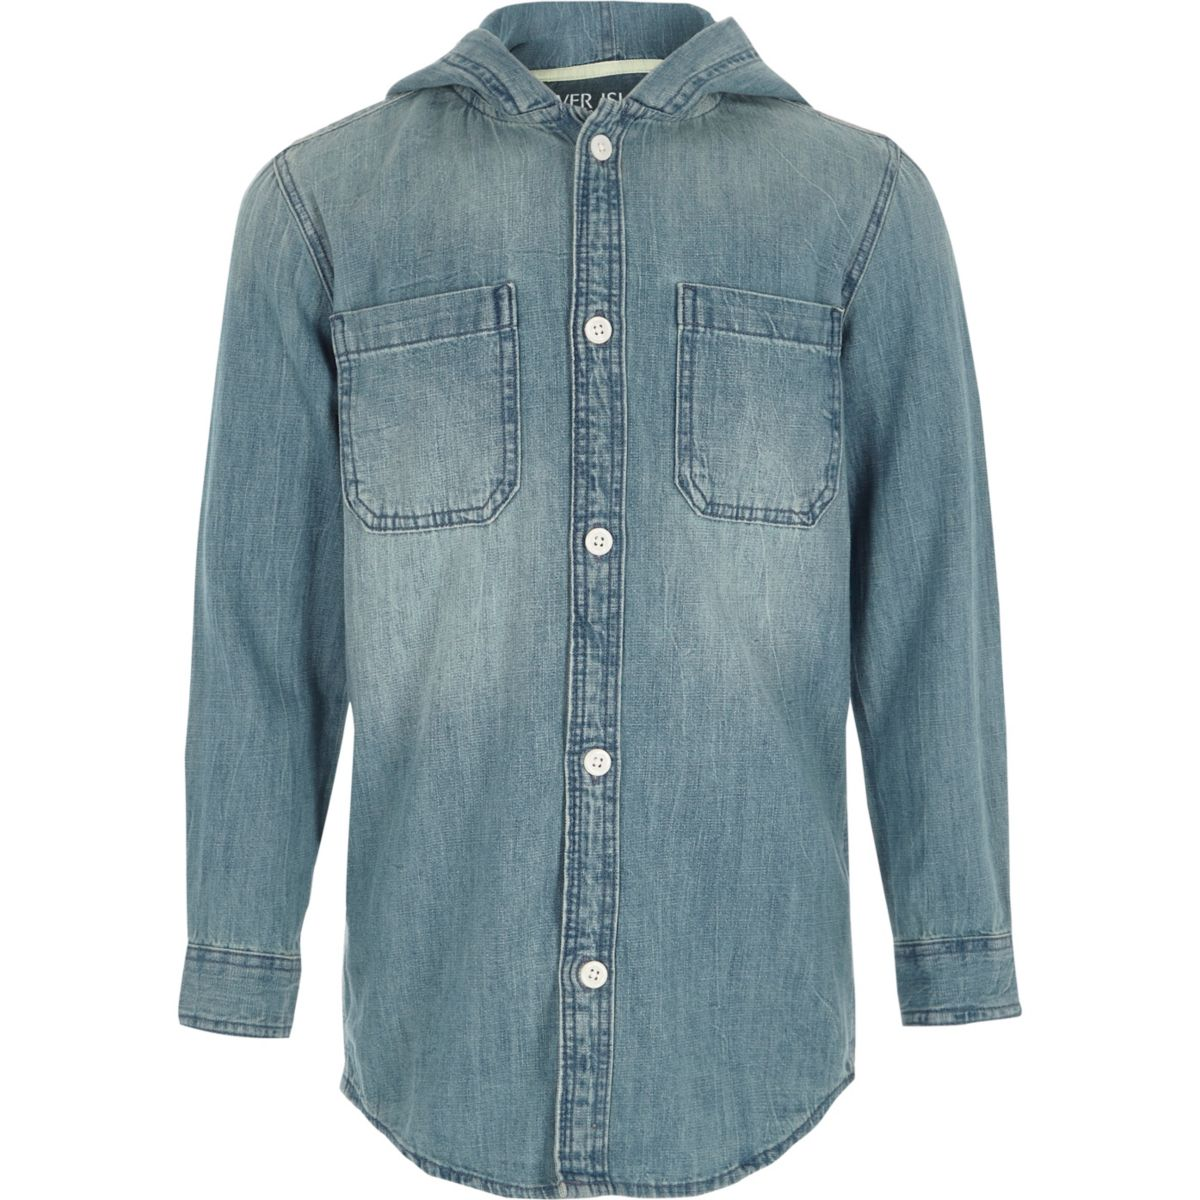 Boys blue long sleeve hooded denim shirt